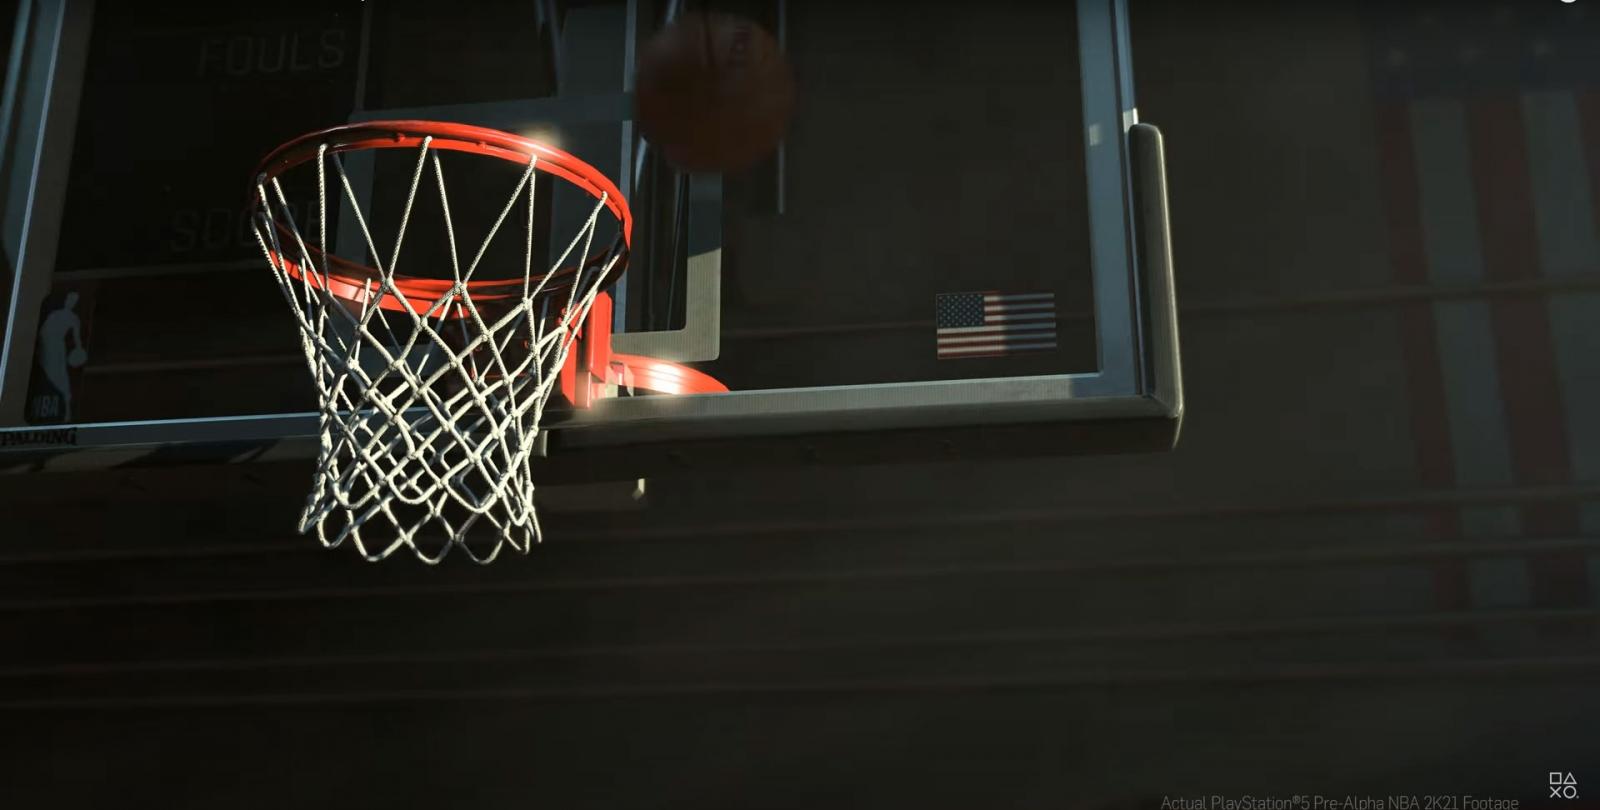 XBOXSeriesX NBA 2K21 Mamba Forever Edition